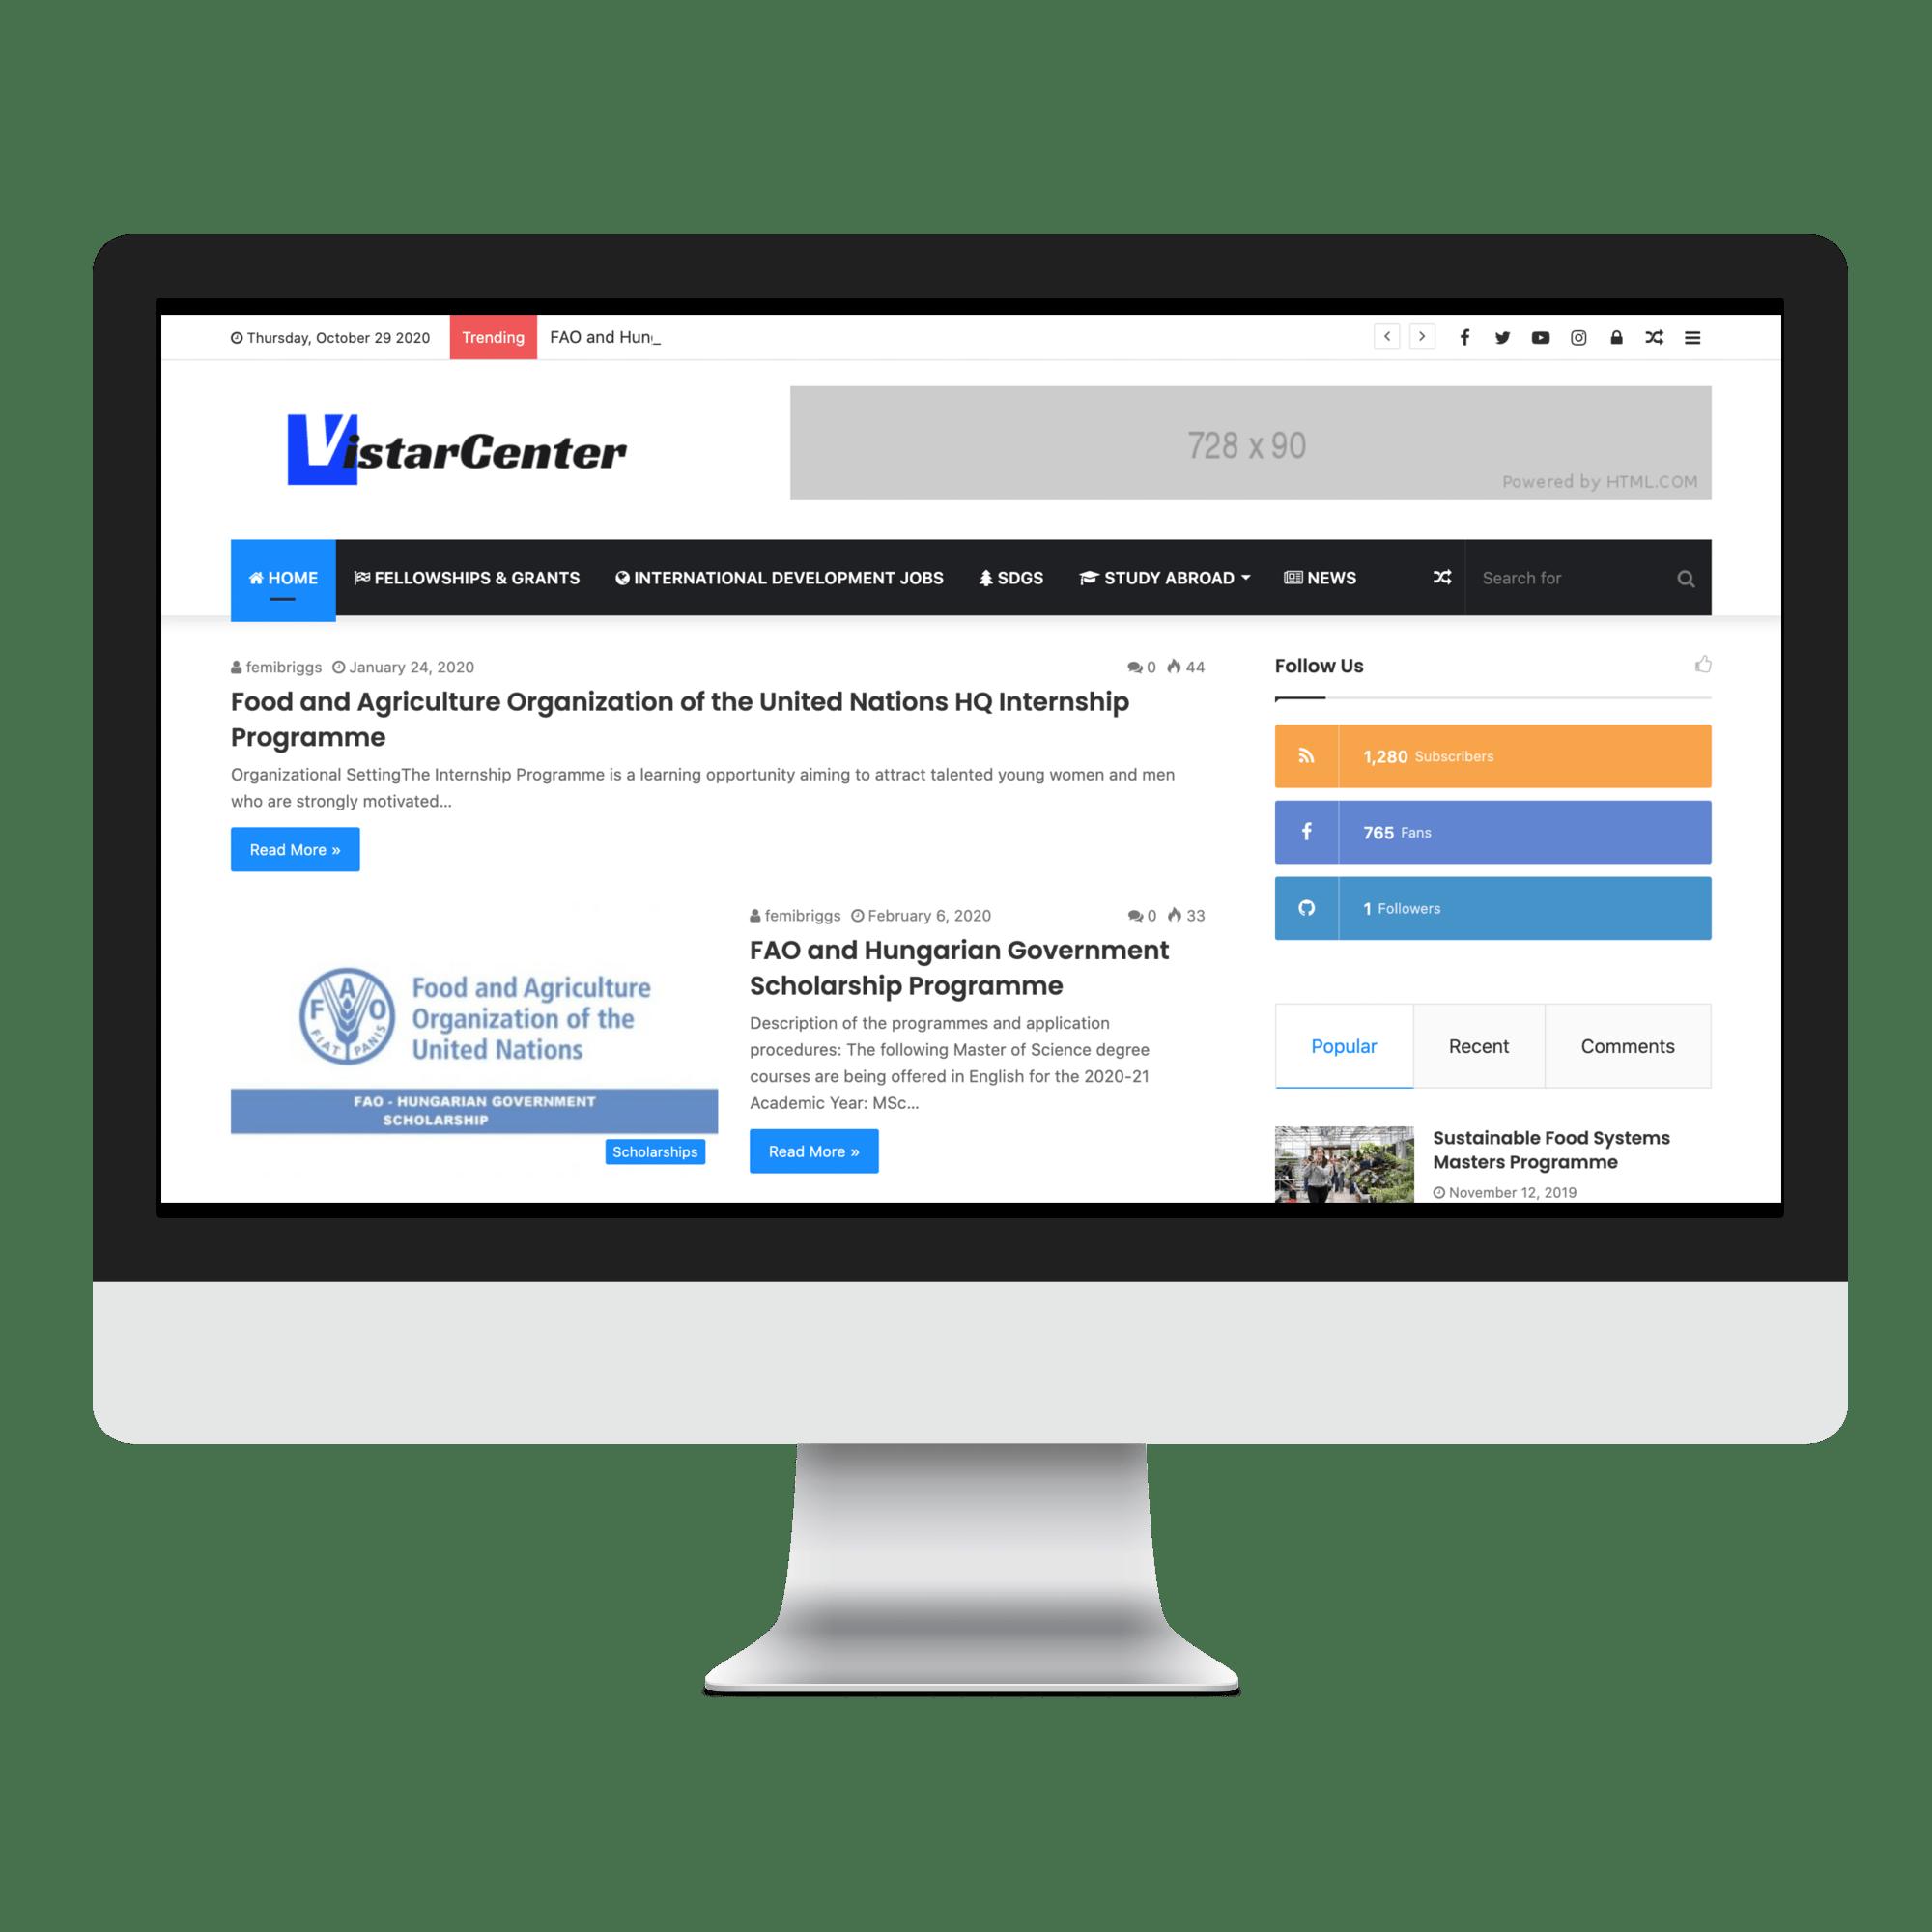 VistarCenter Website Designed by Sigmanox NG